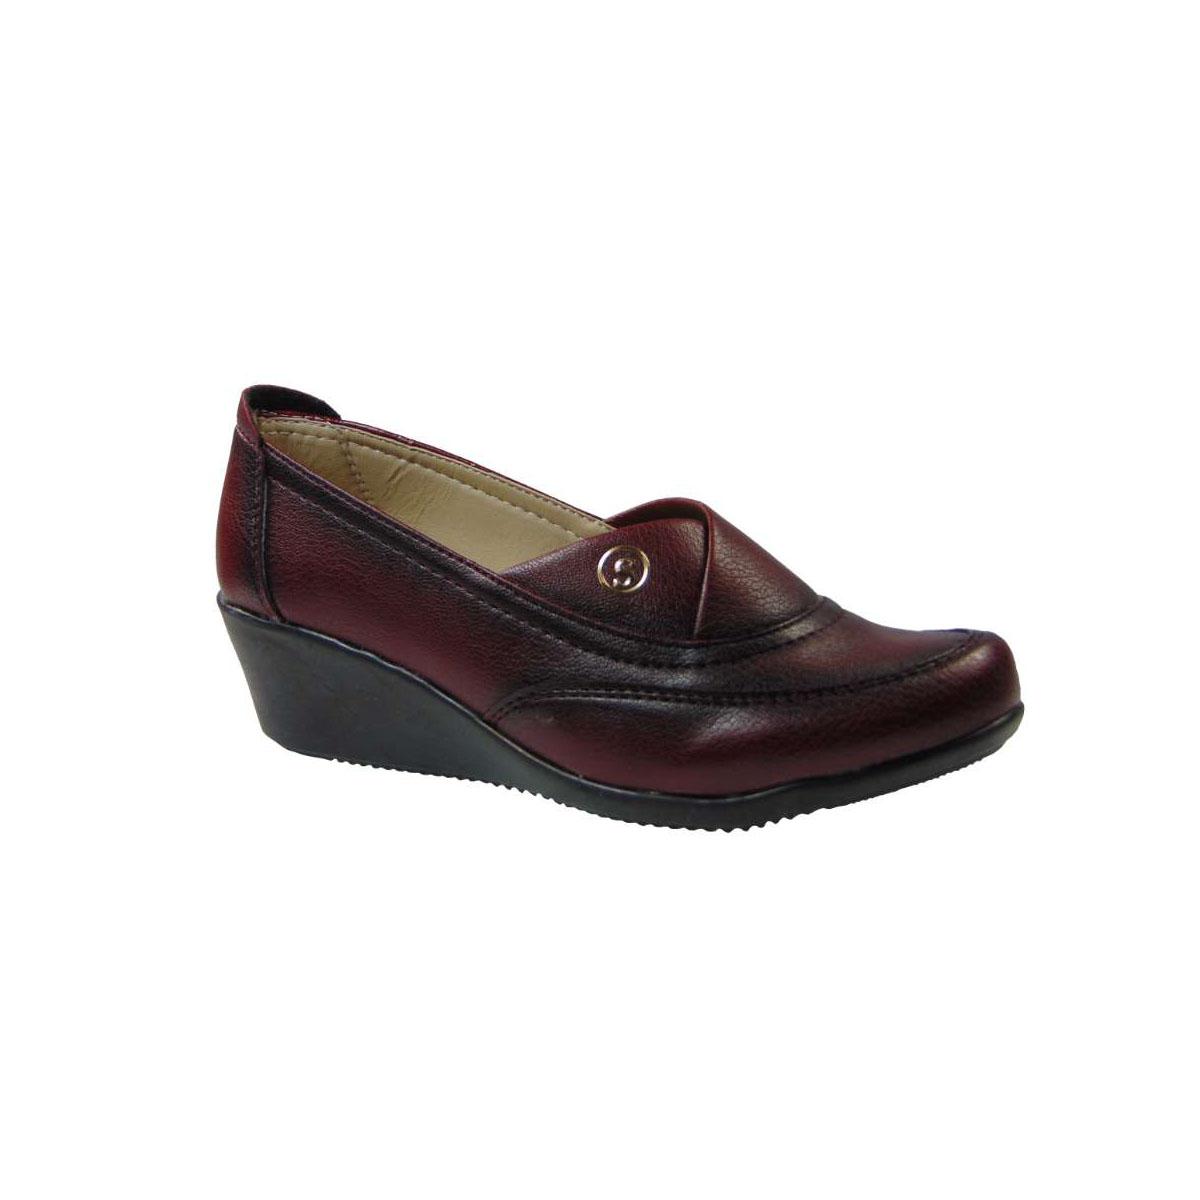 451b244f79c Γυναικεία Slip-on | My Lady Shoes